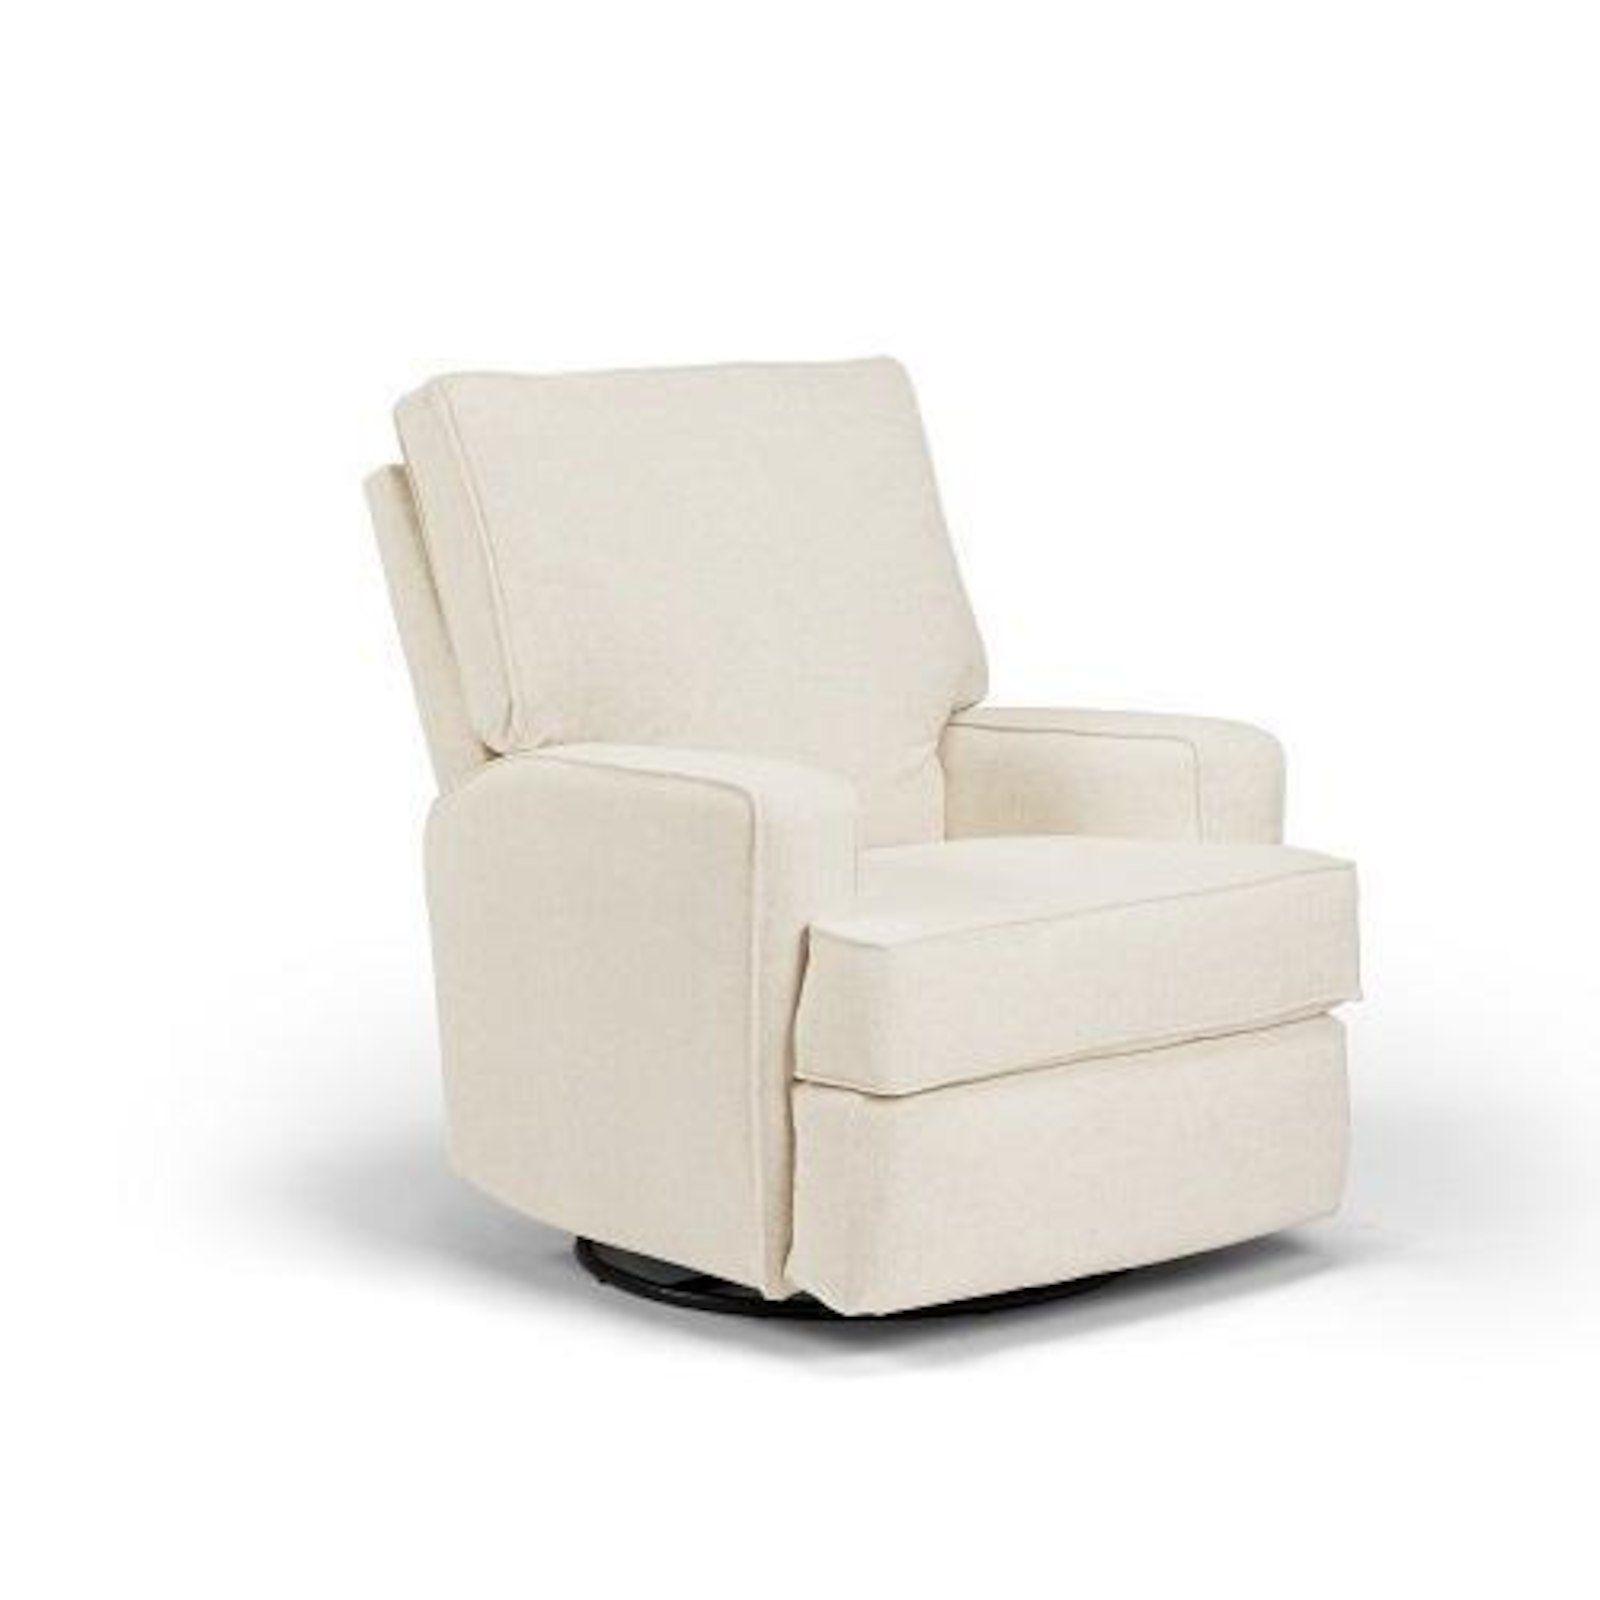 Best Chairs Kersey Swivel Glider Recliner - Linen | Colorful nursery ...